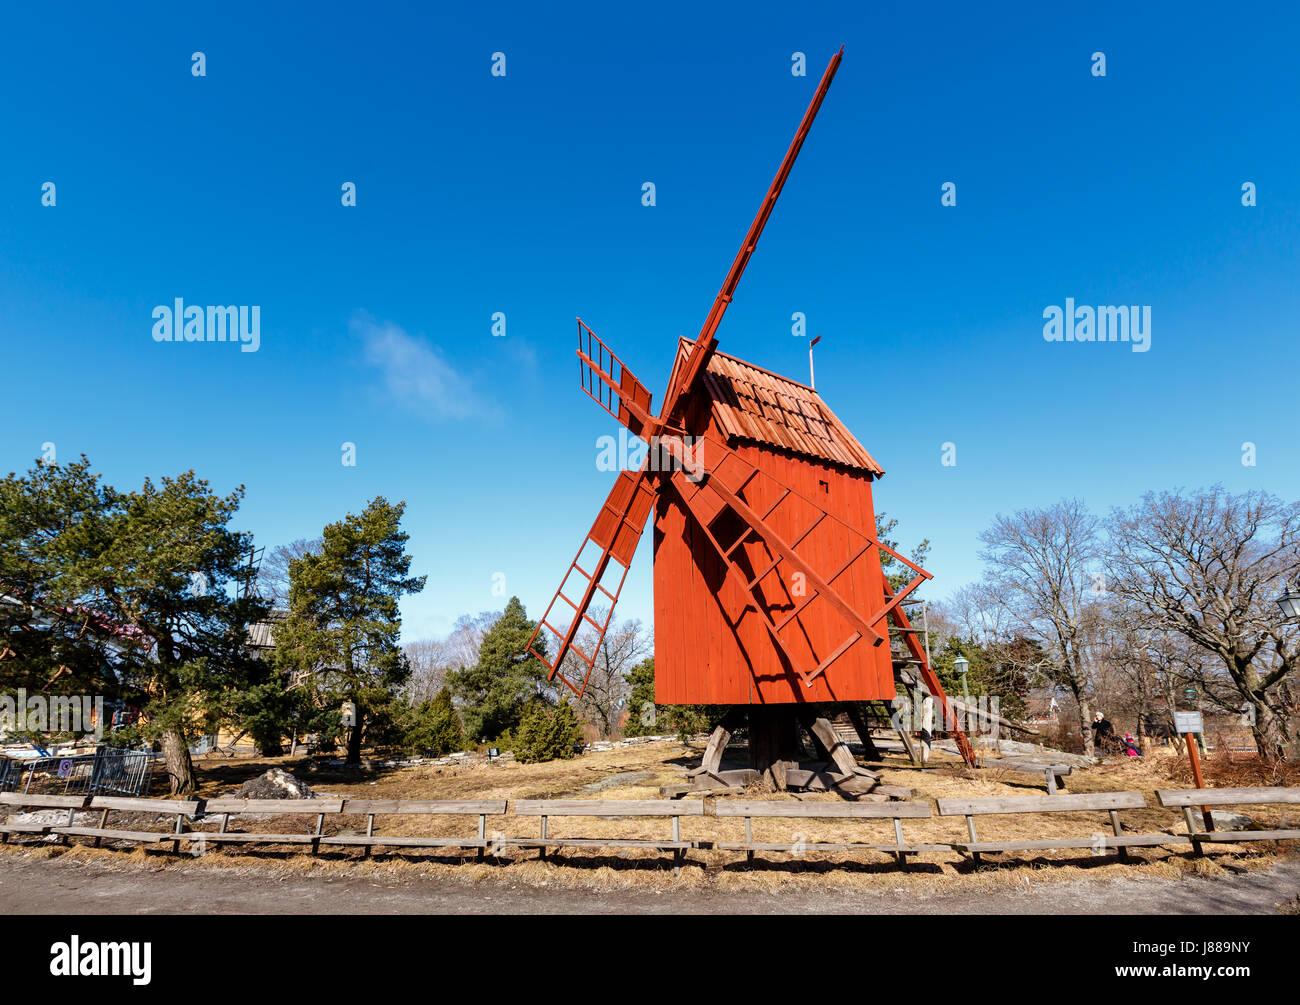 Traditional Swedish Windmill in Skansen National Park, Stockholm, Sweden - Stock Image